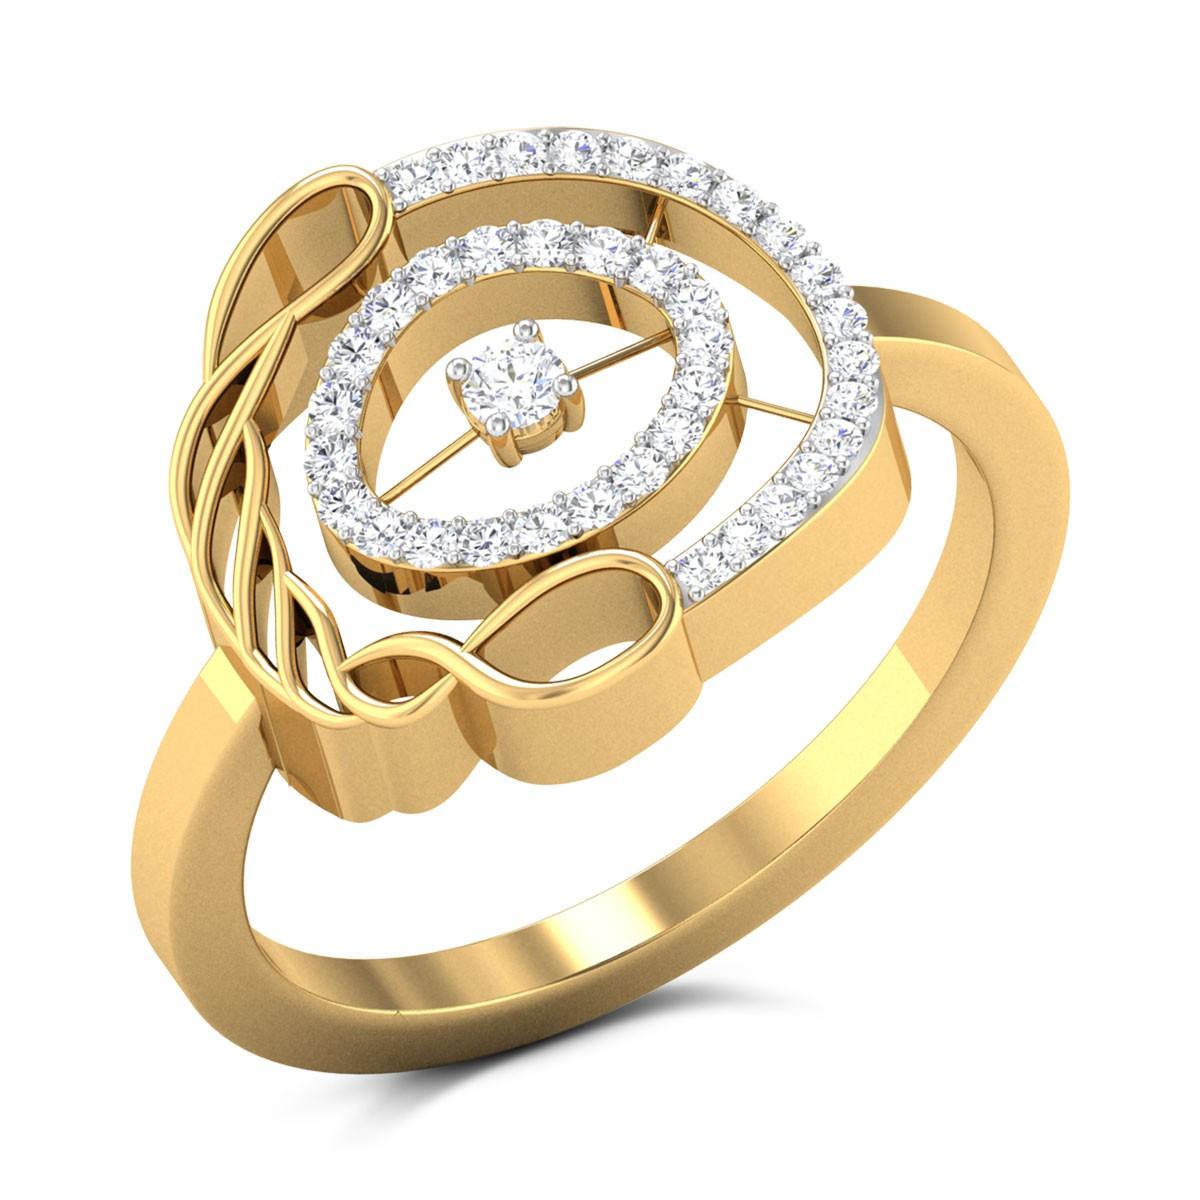 Fabiana Circular Twist Diamond Ring